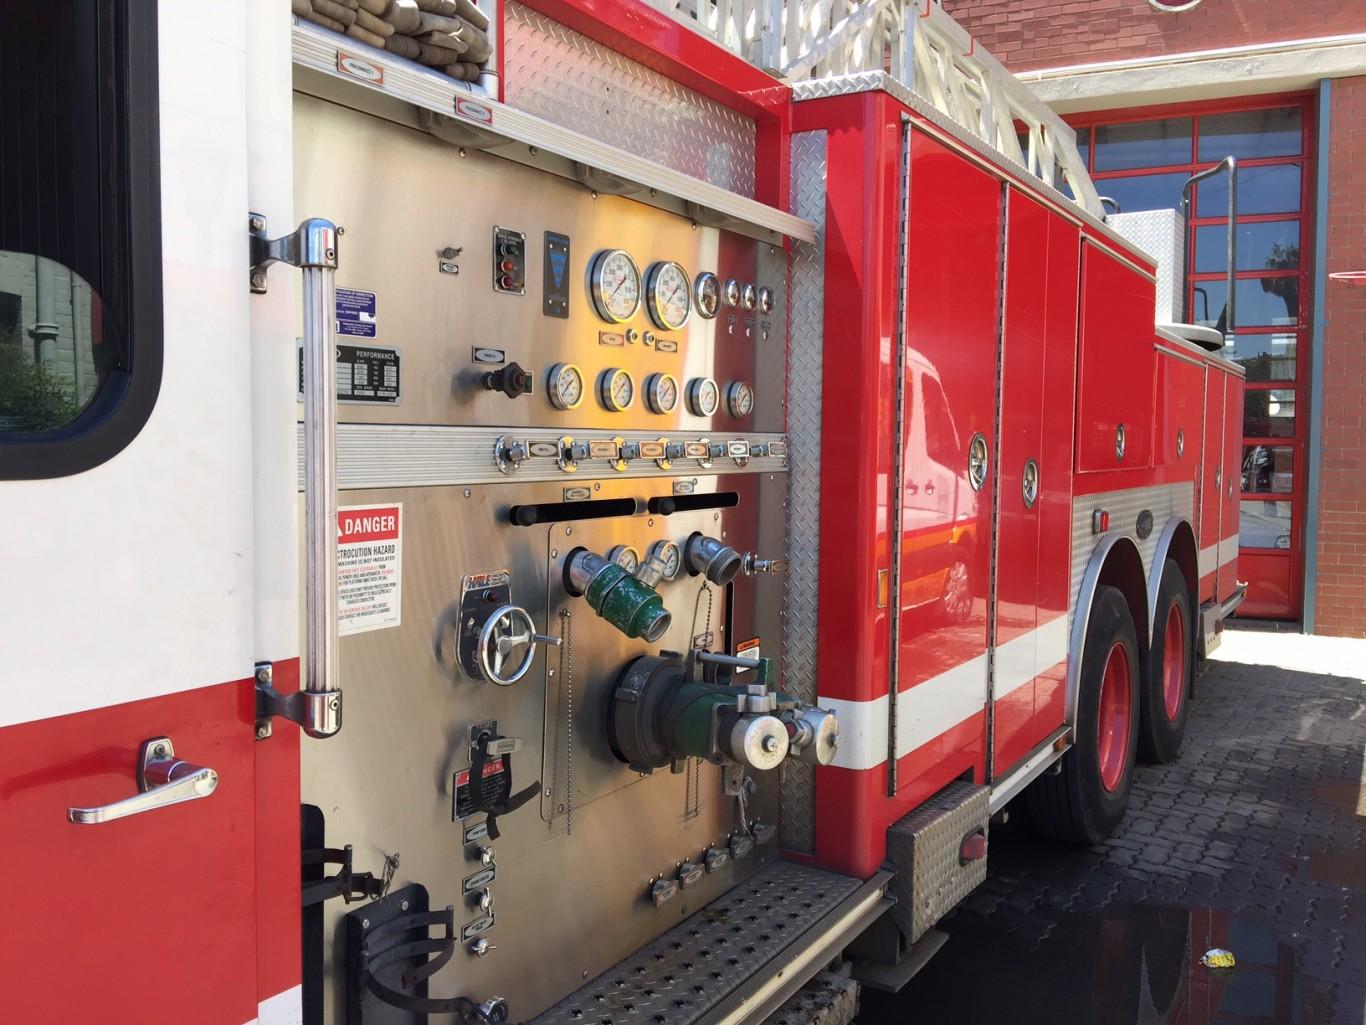 Eight injured in house fire in Pellissier in Bloemfontein